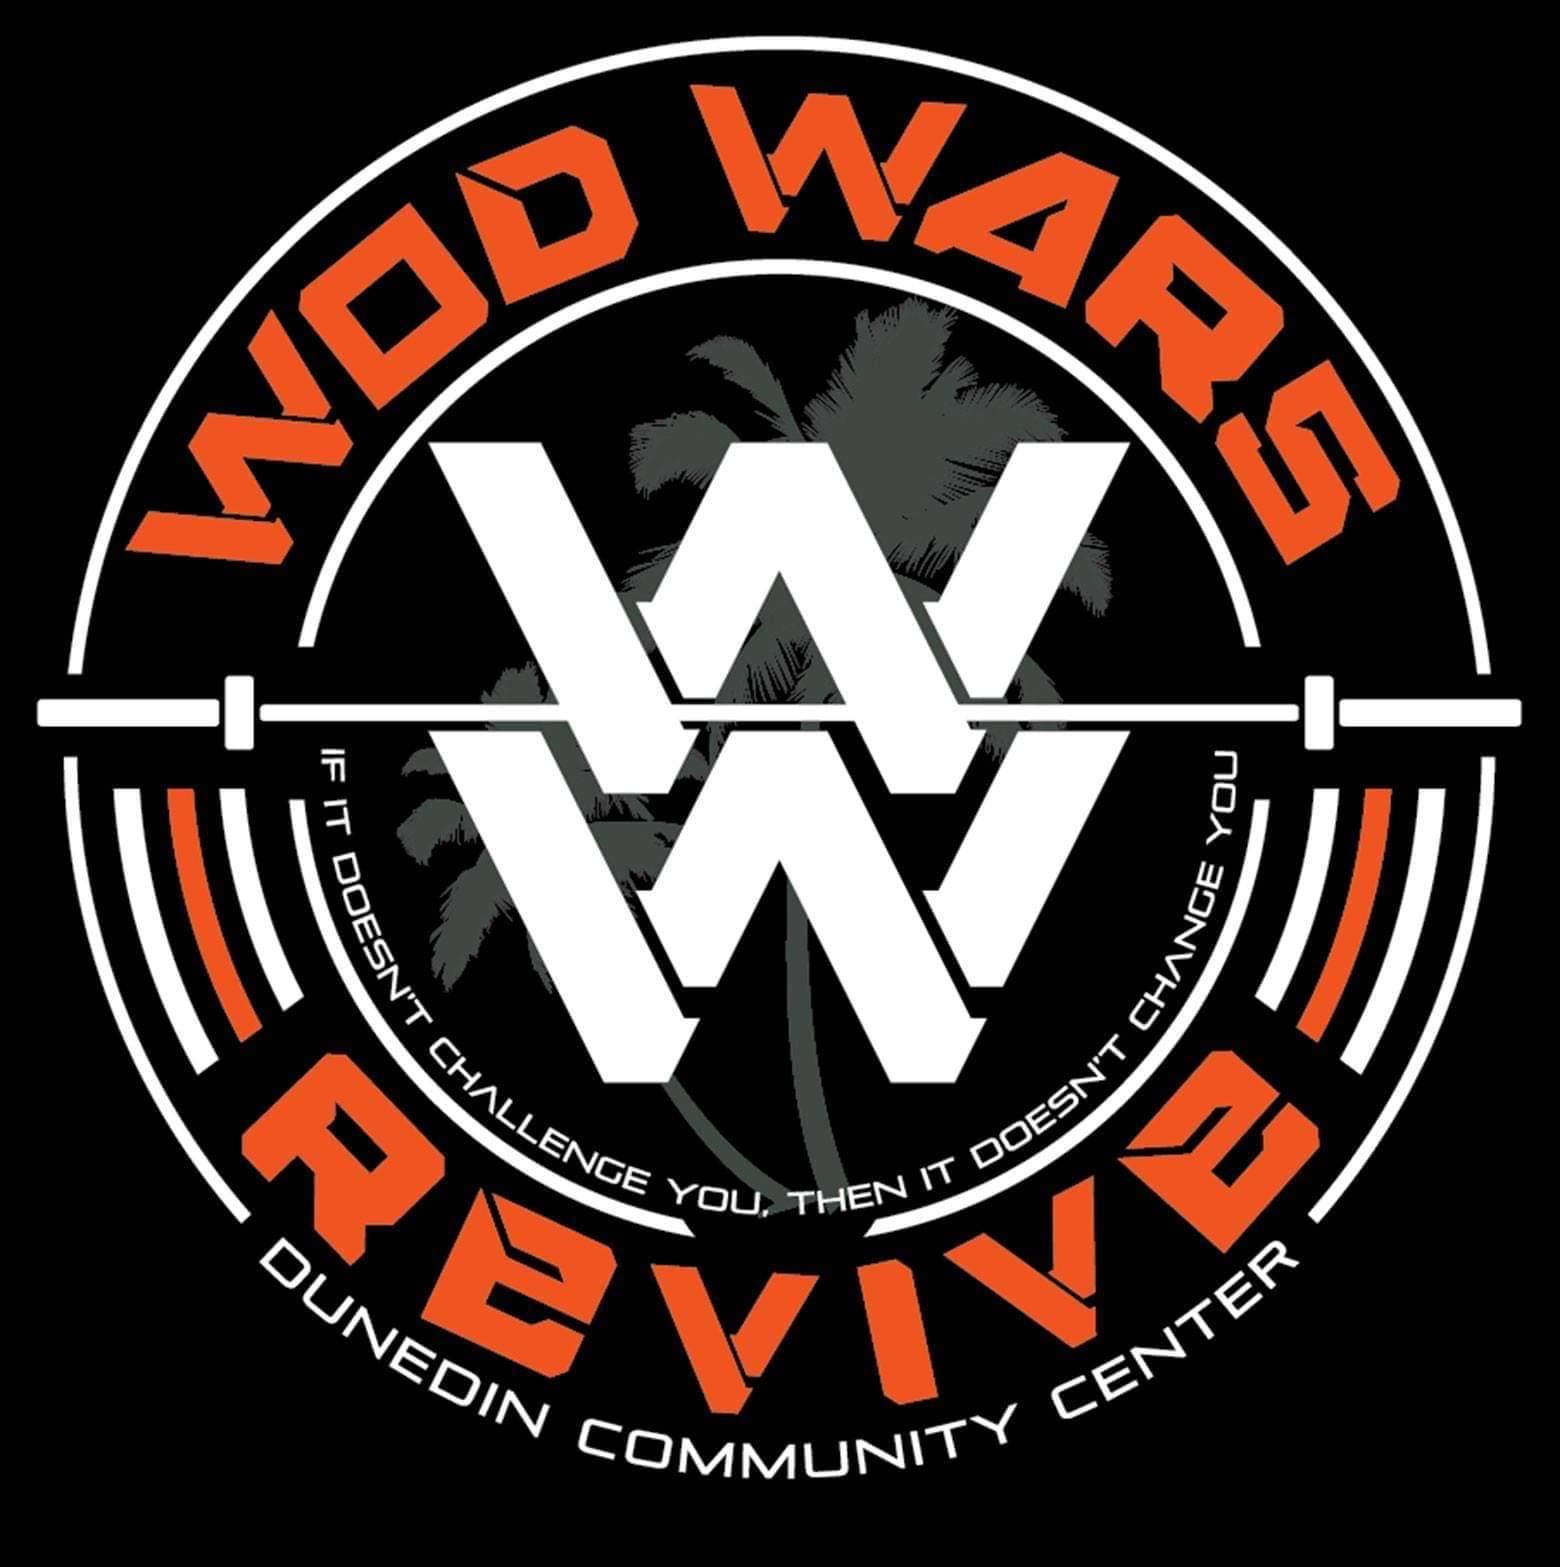 Wod Wars 6